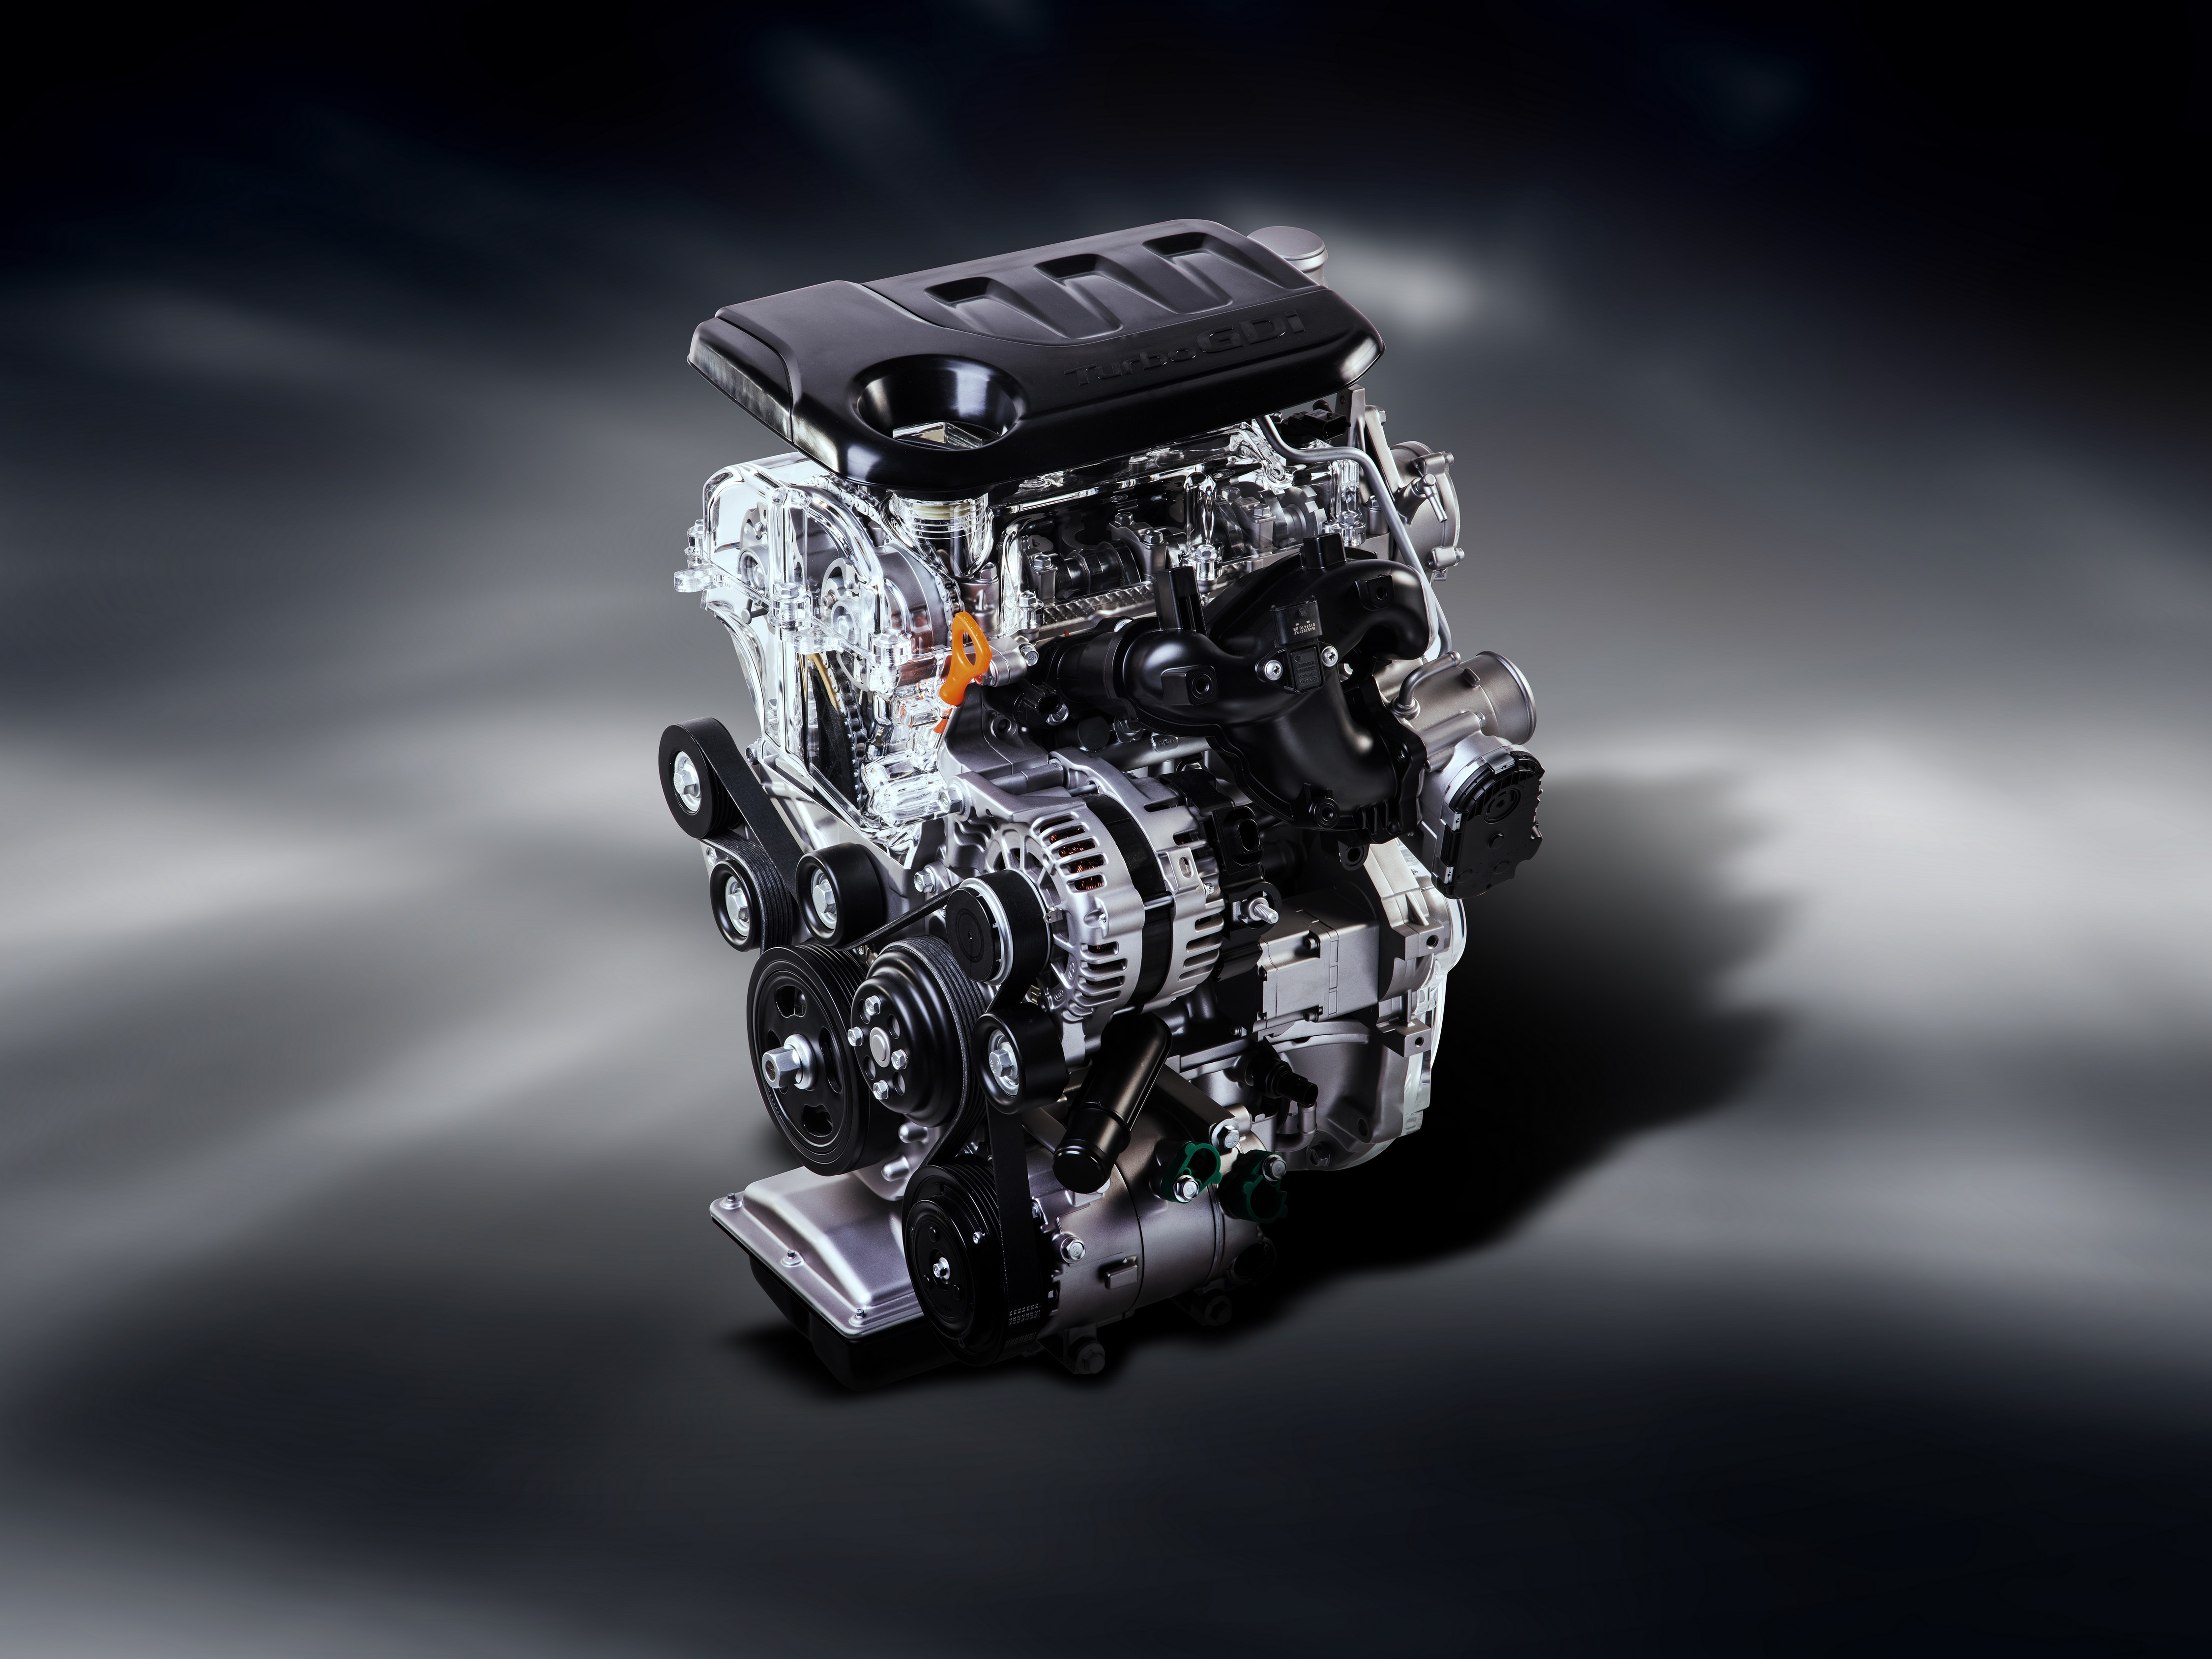 Kia 2 4 Engine Diagram Serpentine Drive Belt Replacement Hyundai K2700 Kappa Turbo Liter Hp Revealed The Korean Car Blog 1 0